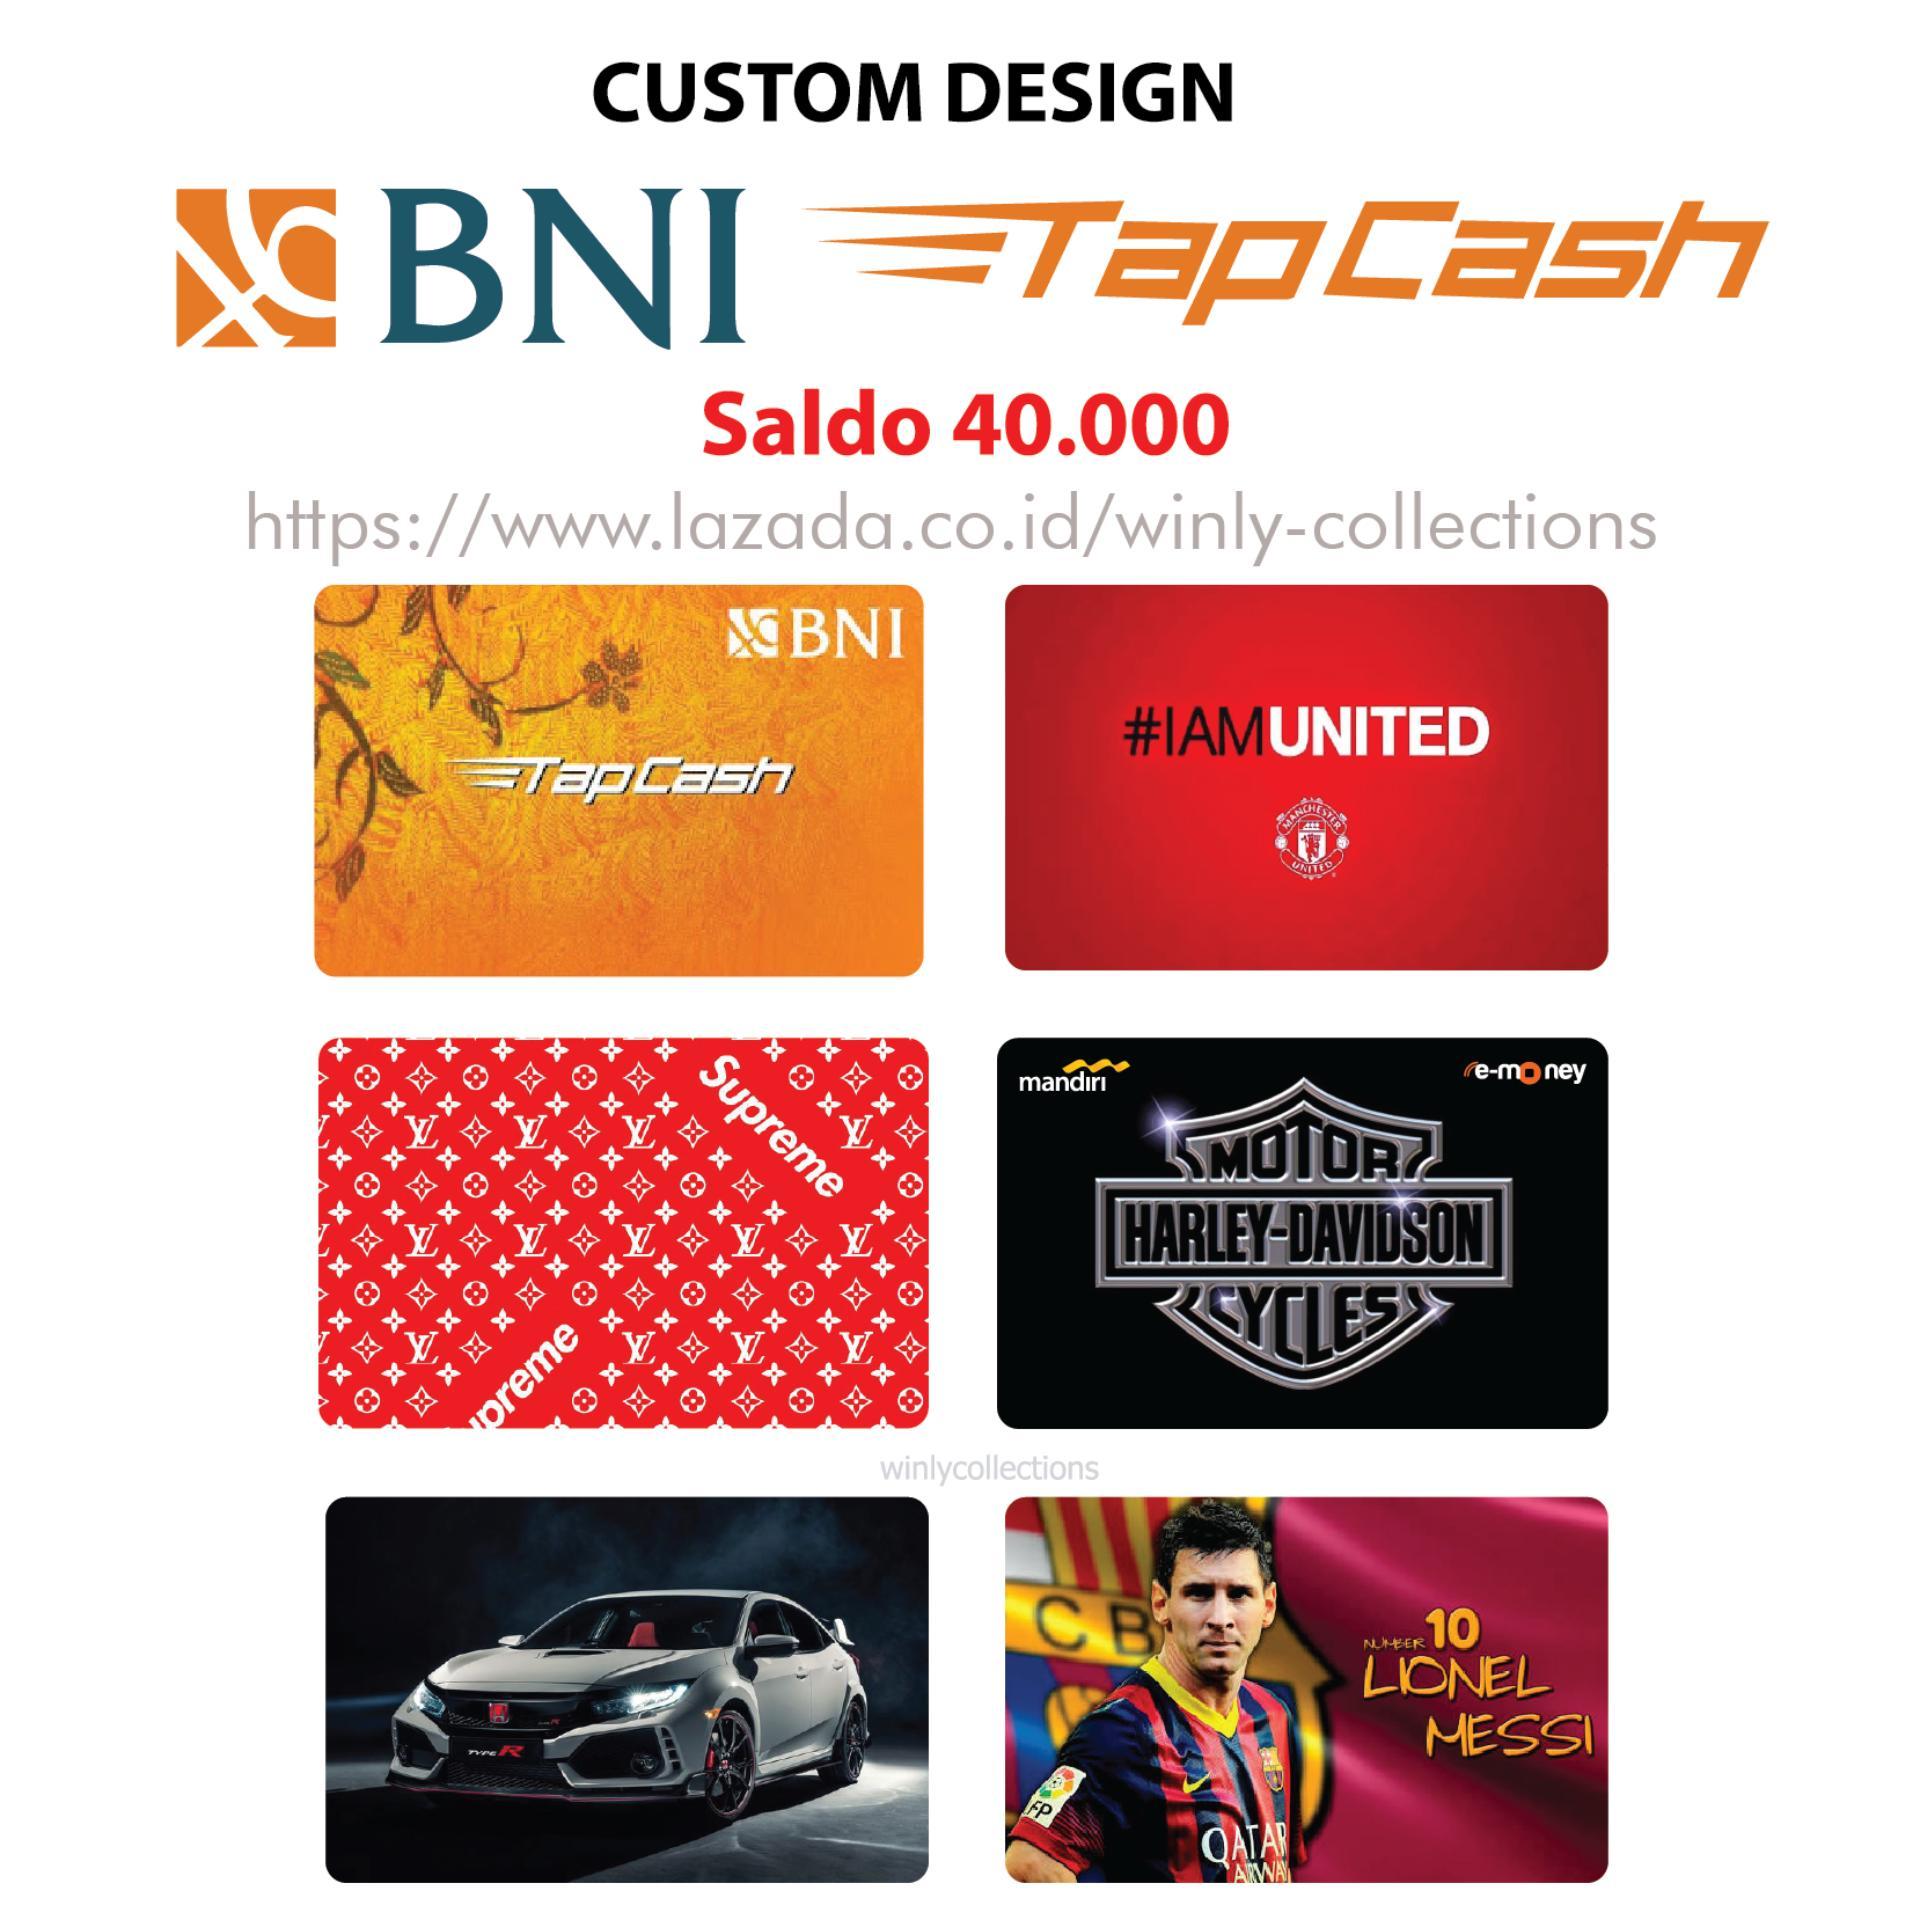 Fitur Harga Spesial Kartu Emoney Mandiri Plat Nomor Custom Print 1 Etoll Frint Sisi Bni Tapcash Design 2 Saldo 30 Rb